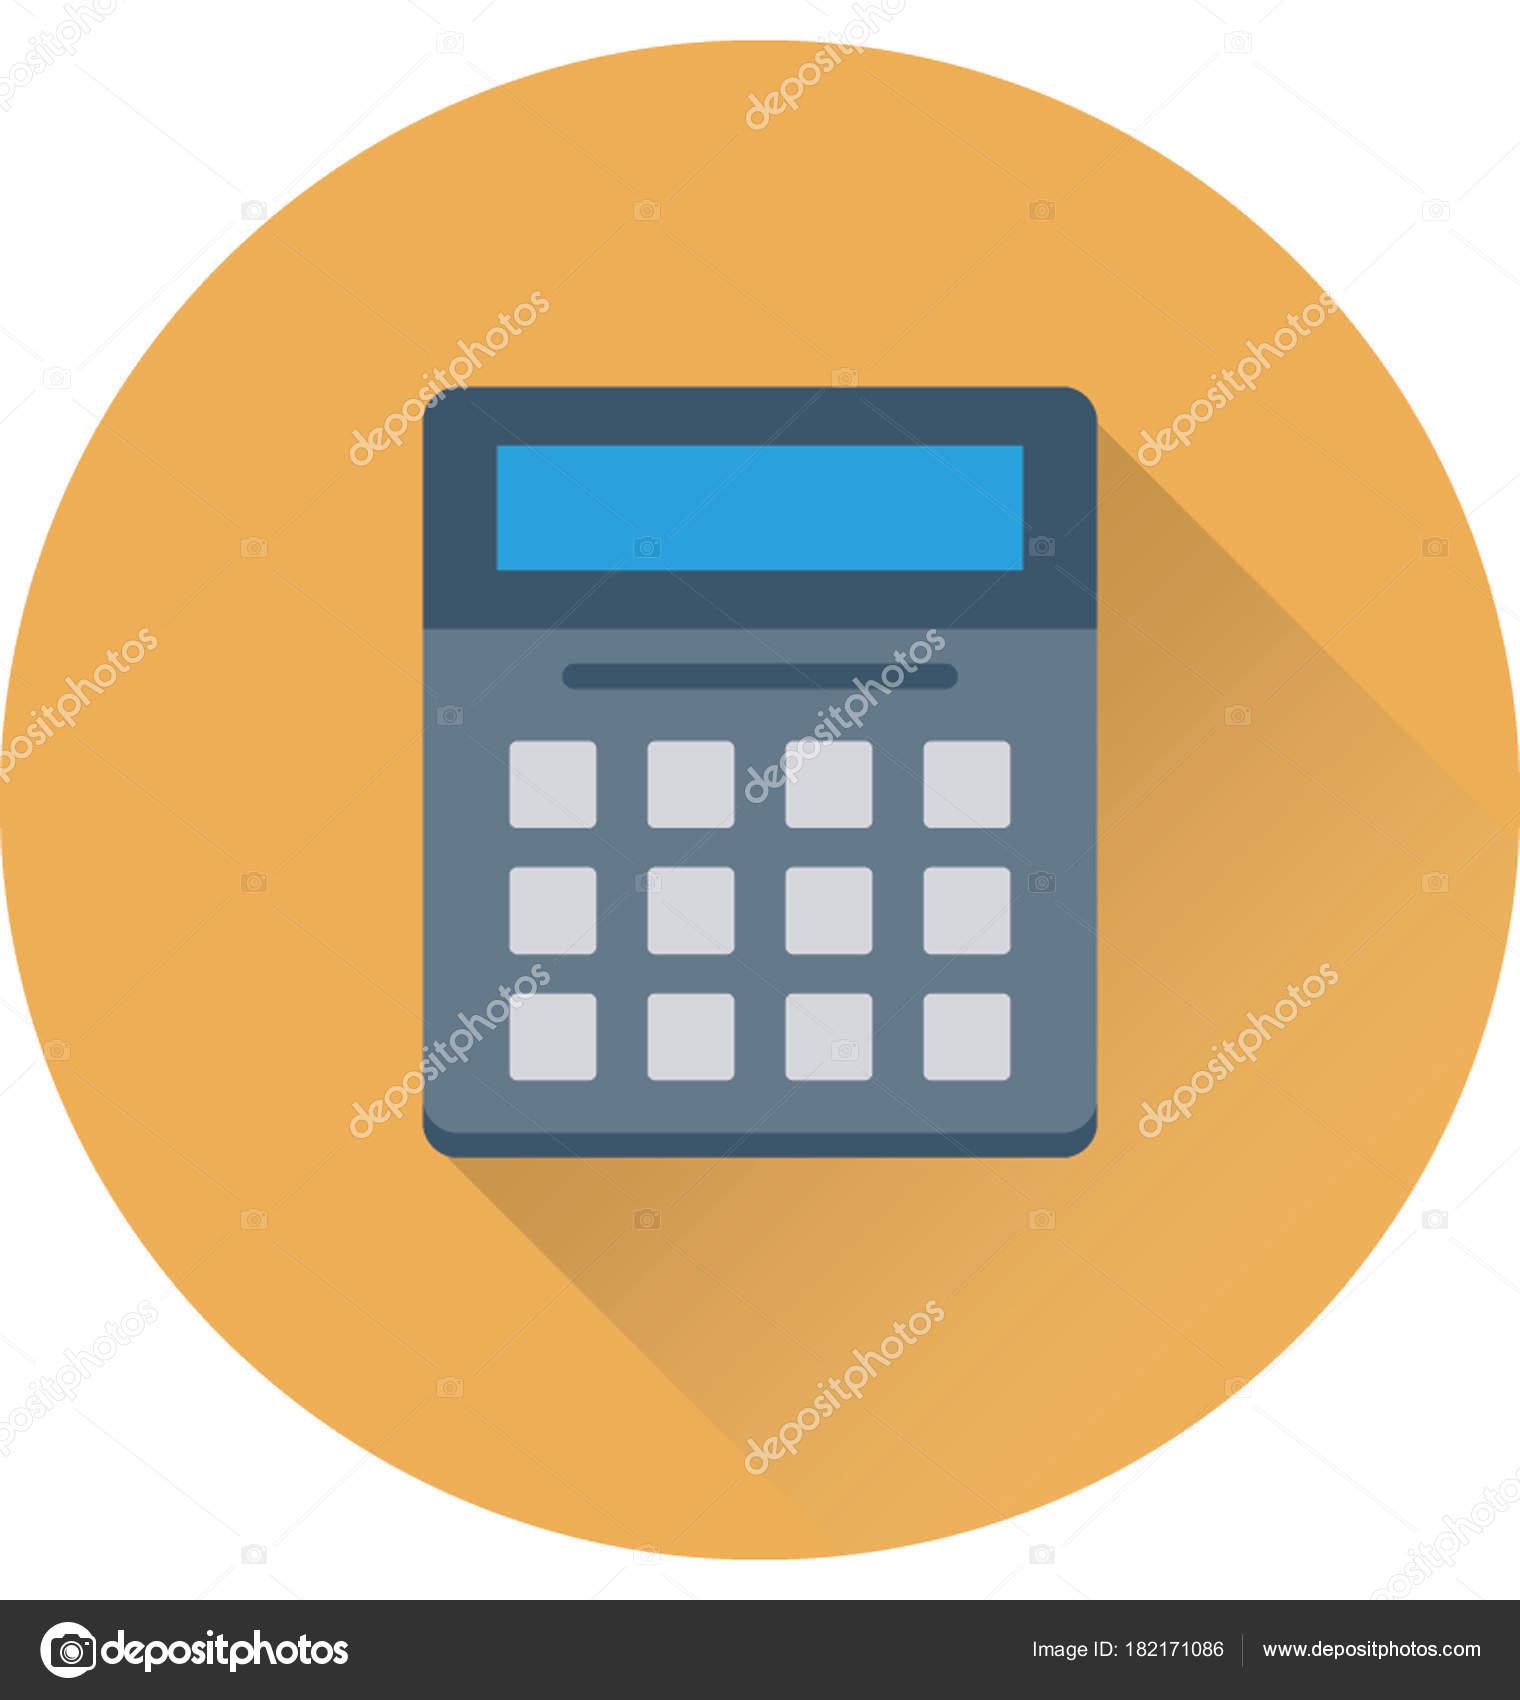 Calculadora Plana Vector Icono — Vector de stock © prosymbols #182171086